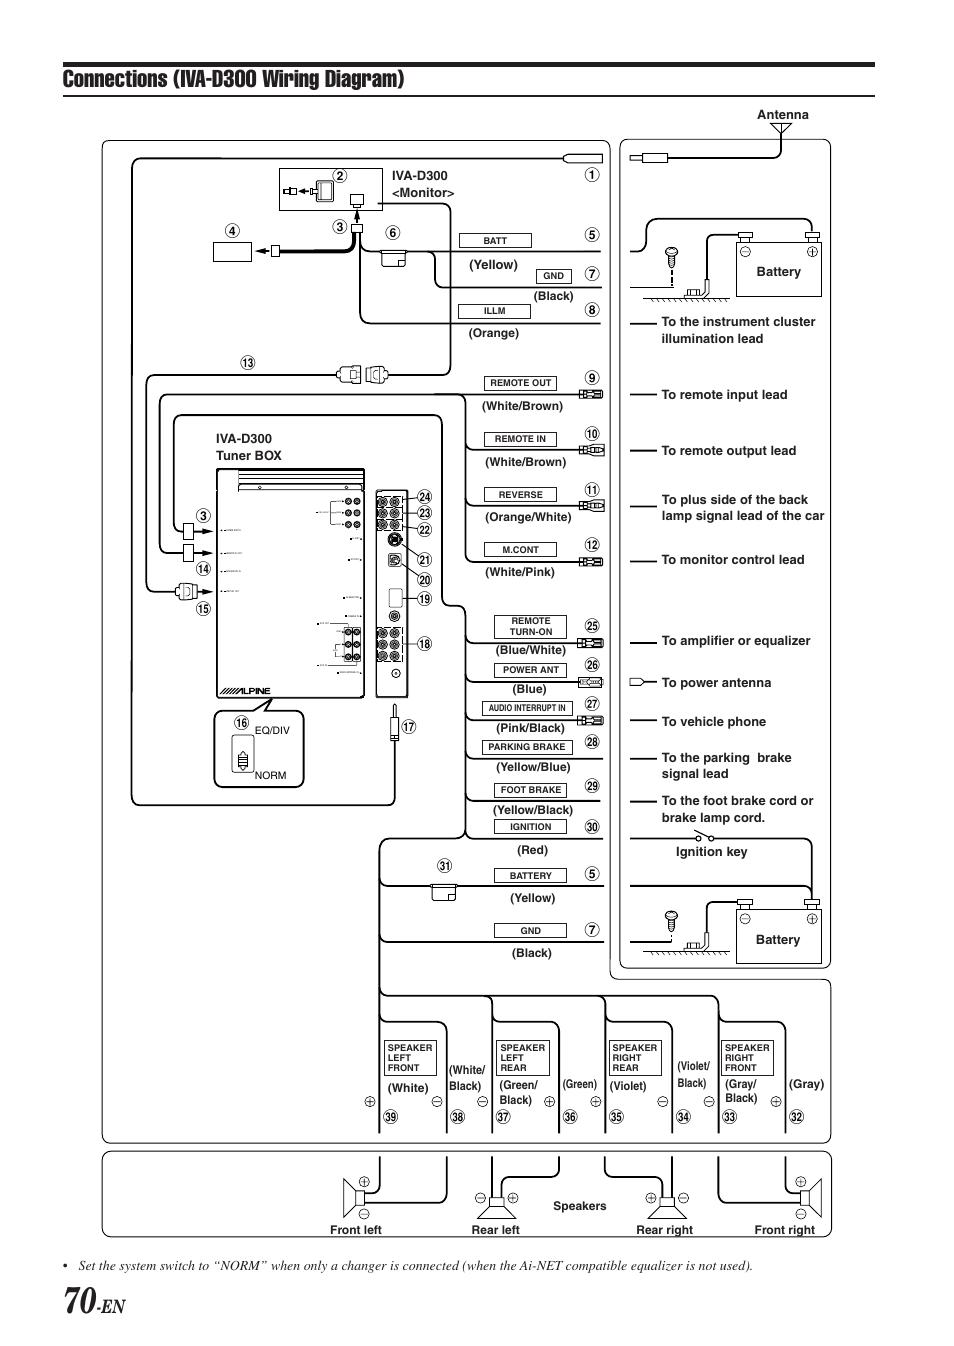 alpine iva d300 page72?resize\\\\\\\\\\\\\\\\\\\\\\\\\\\\\\\=665%2C938 case 85xt wiring diagram bobcat s300 wiring diagram \u2022 wiring case 95xt wiring diagram at eliteediting.co